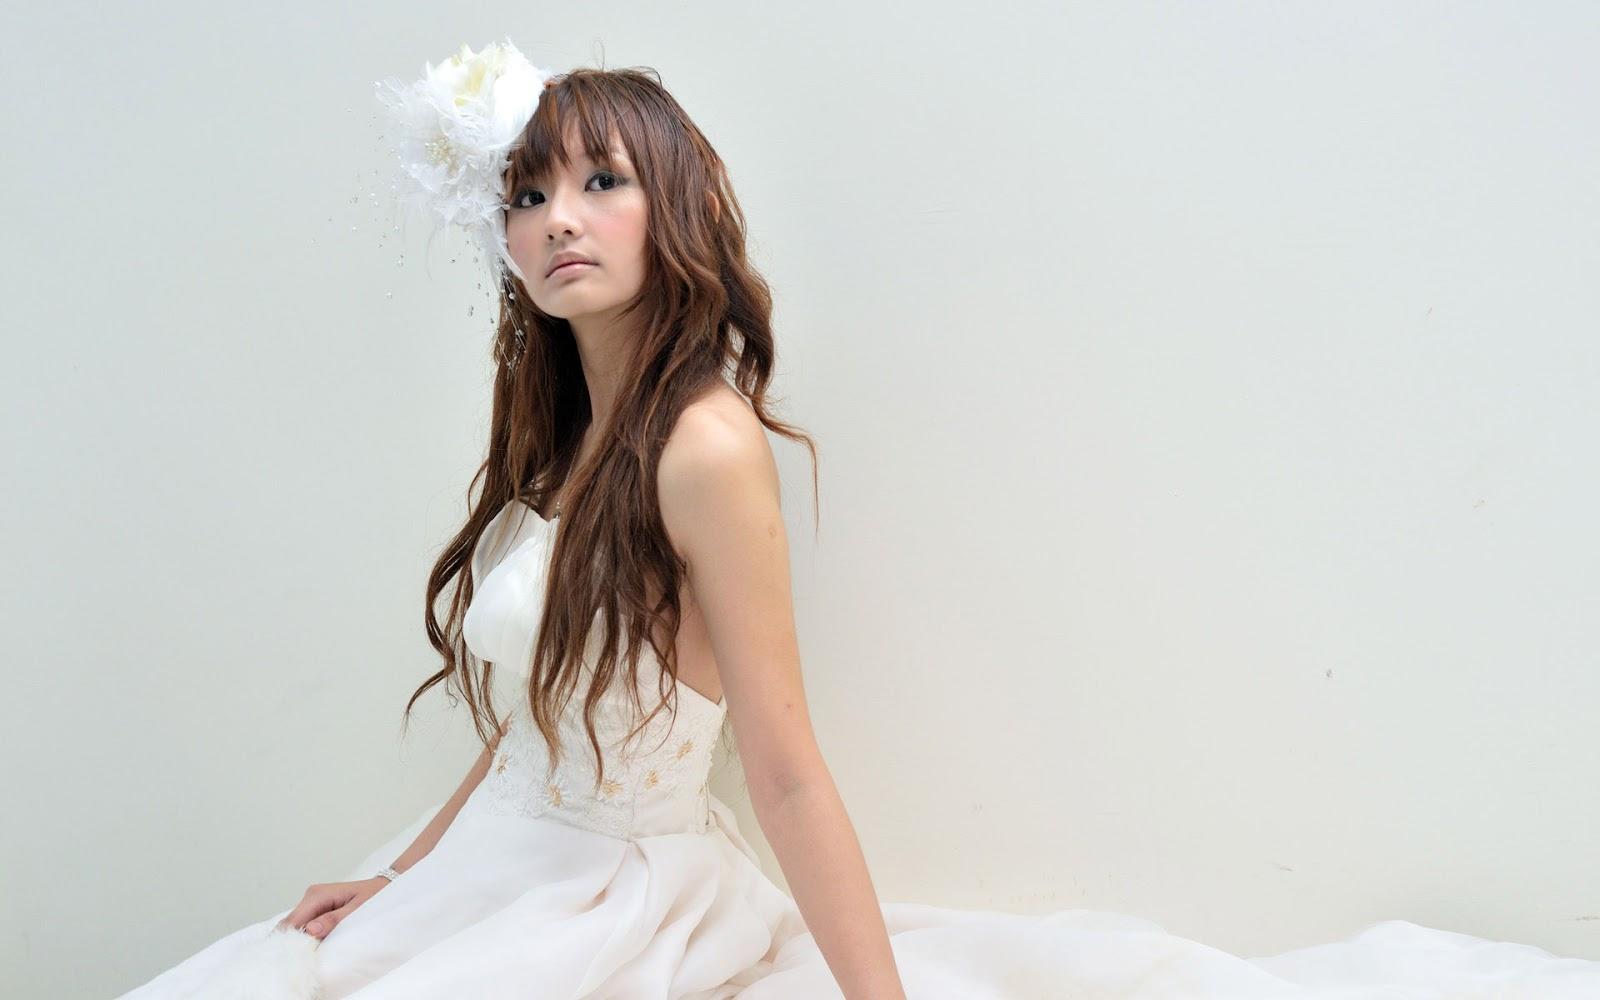 japanese actress model - photo #24